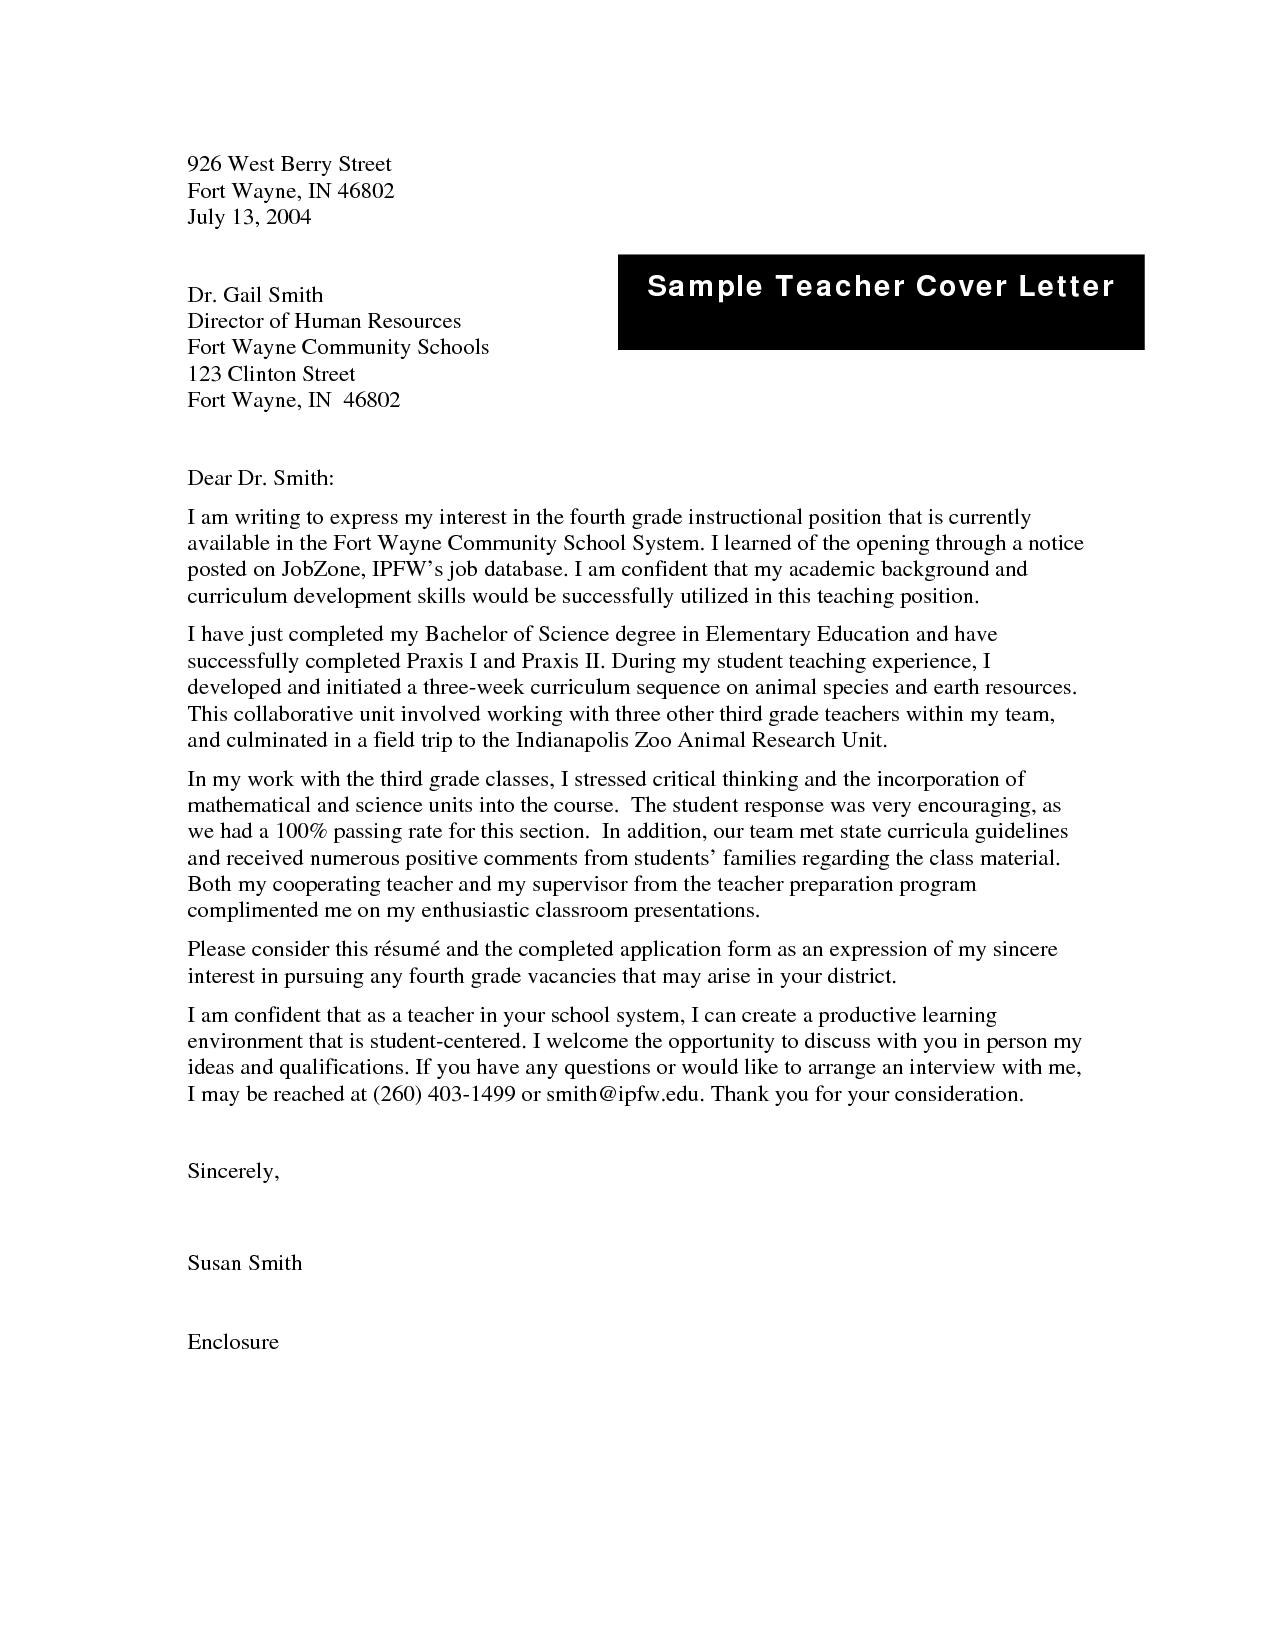 Rules in Writing Cover Letter Example Teacher - wikiresume.com